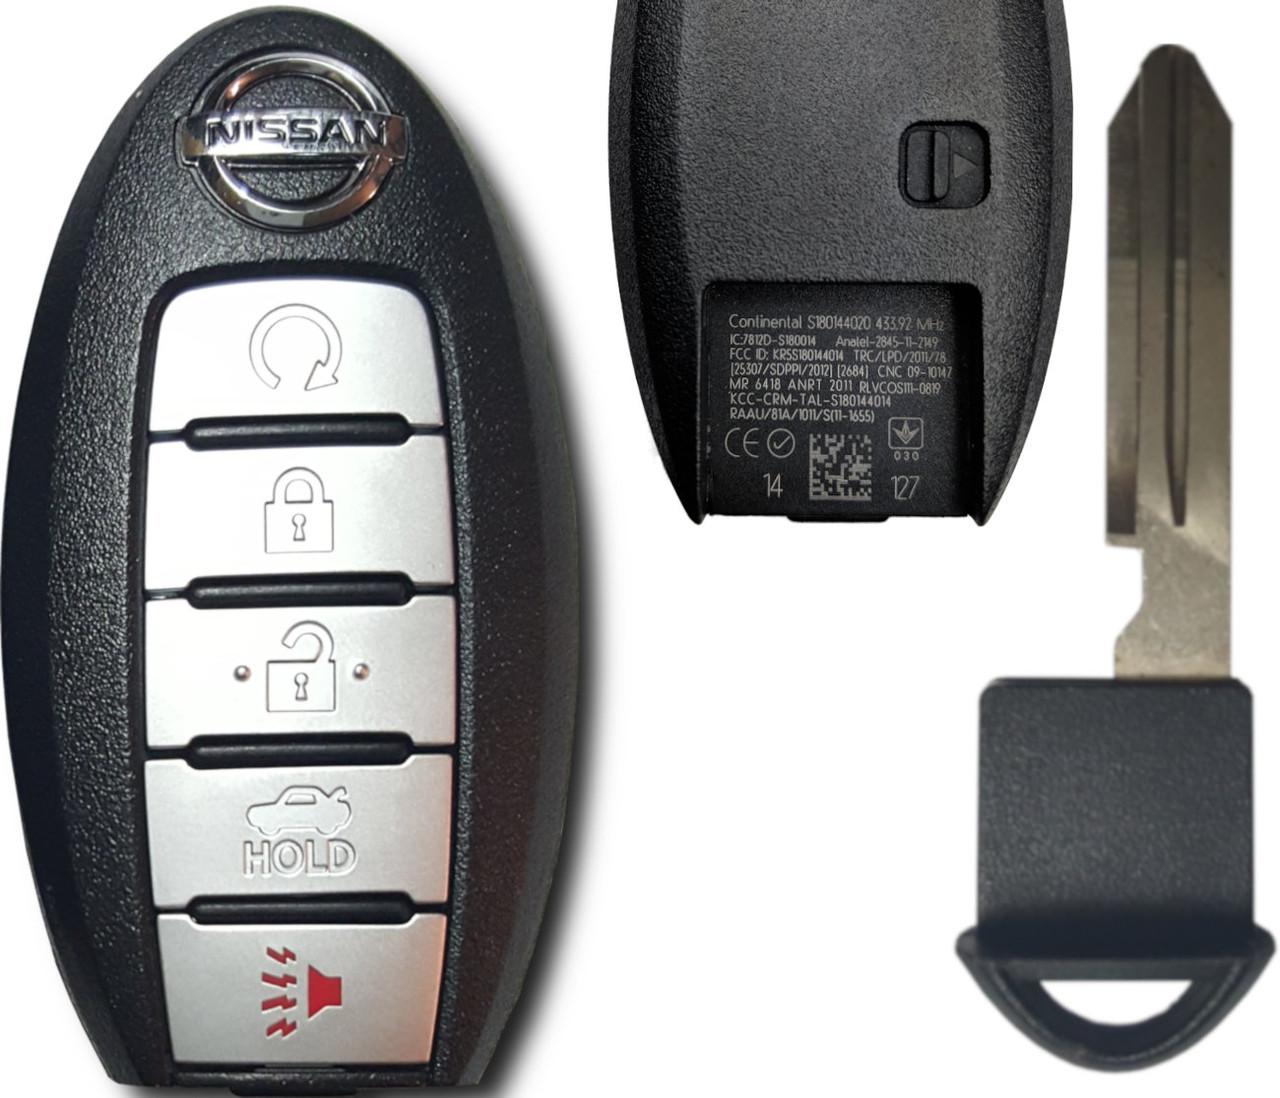 Nissan Altima 7812D-S180014 , S180144020 KR5S180144014 7812D-S180014 Key - Prox Smart